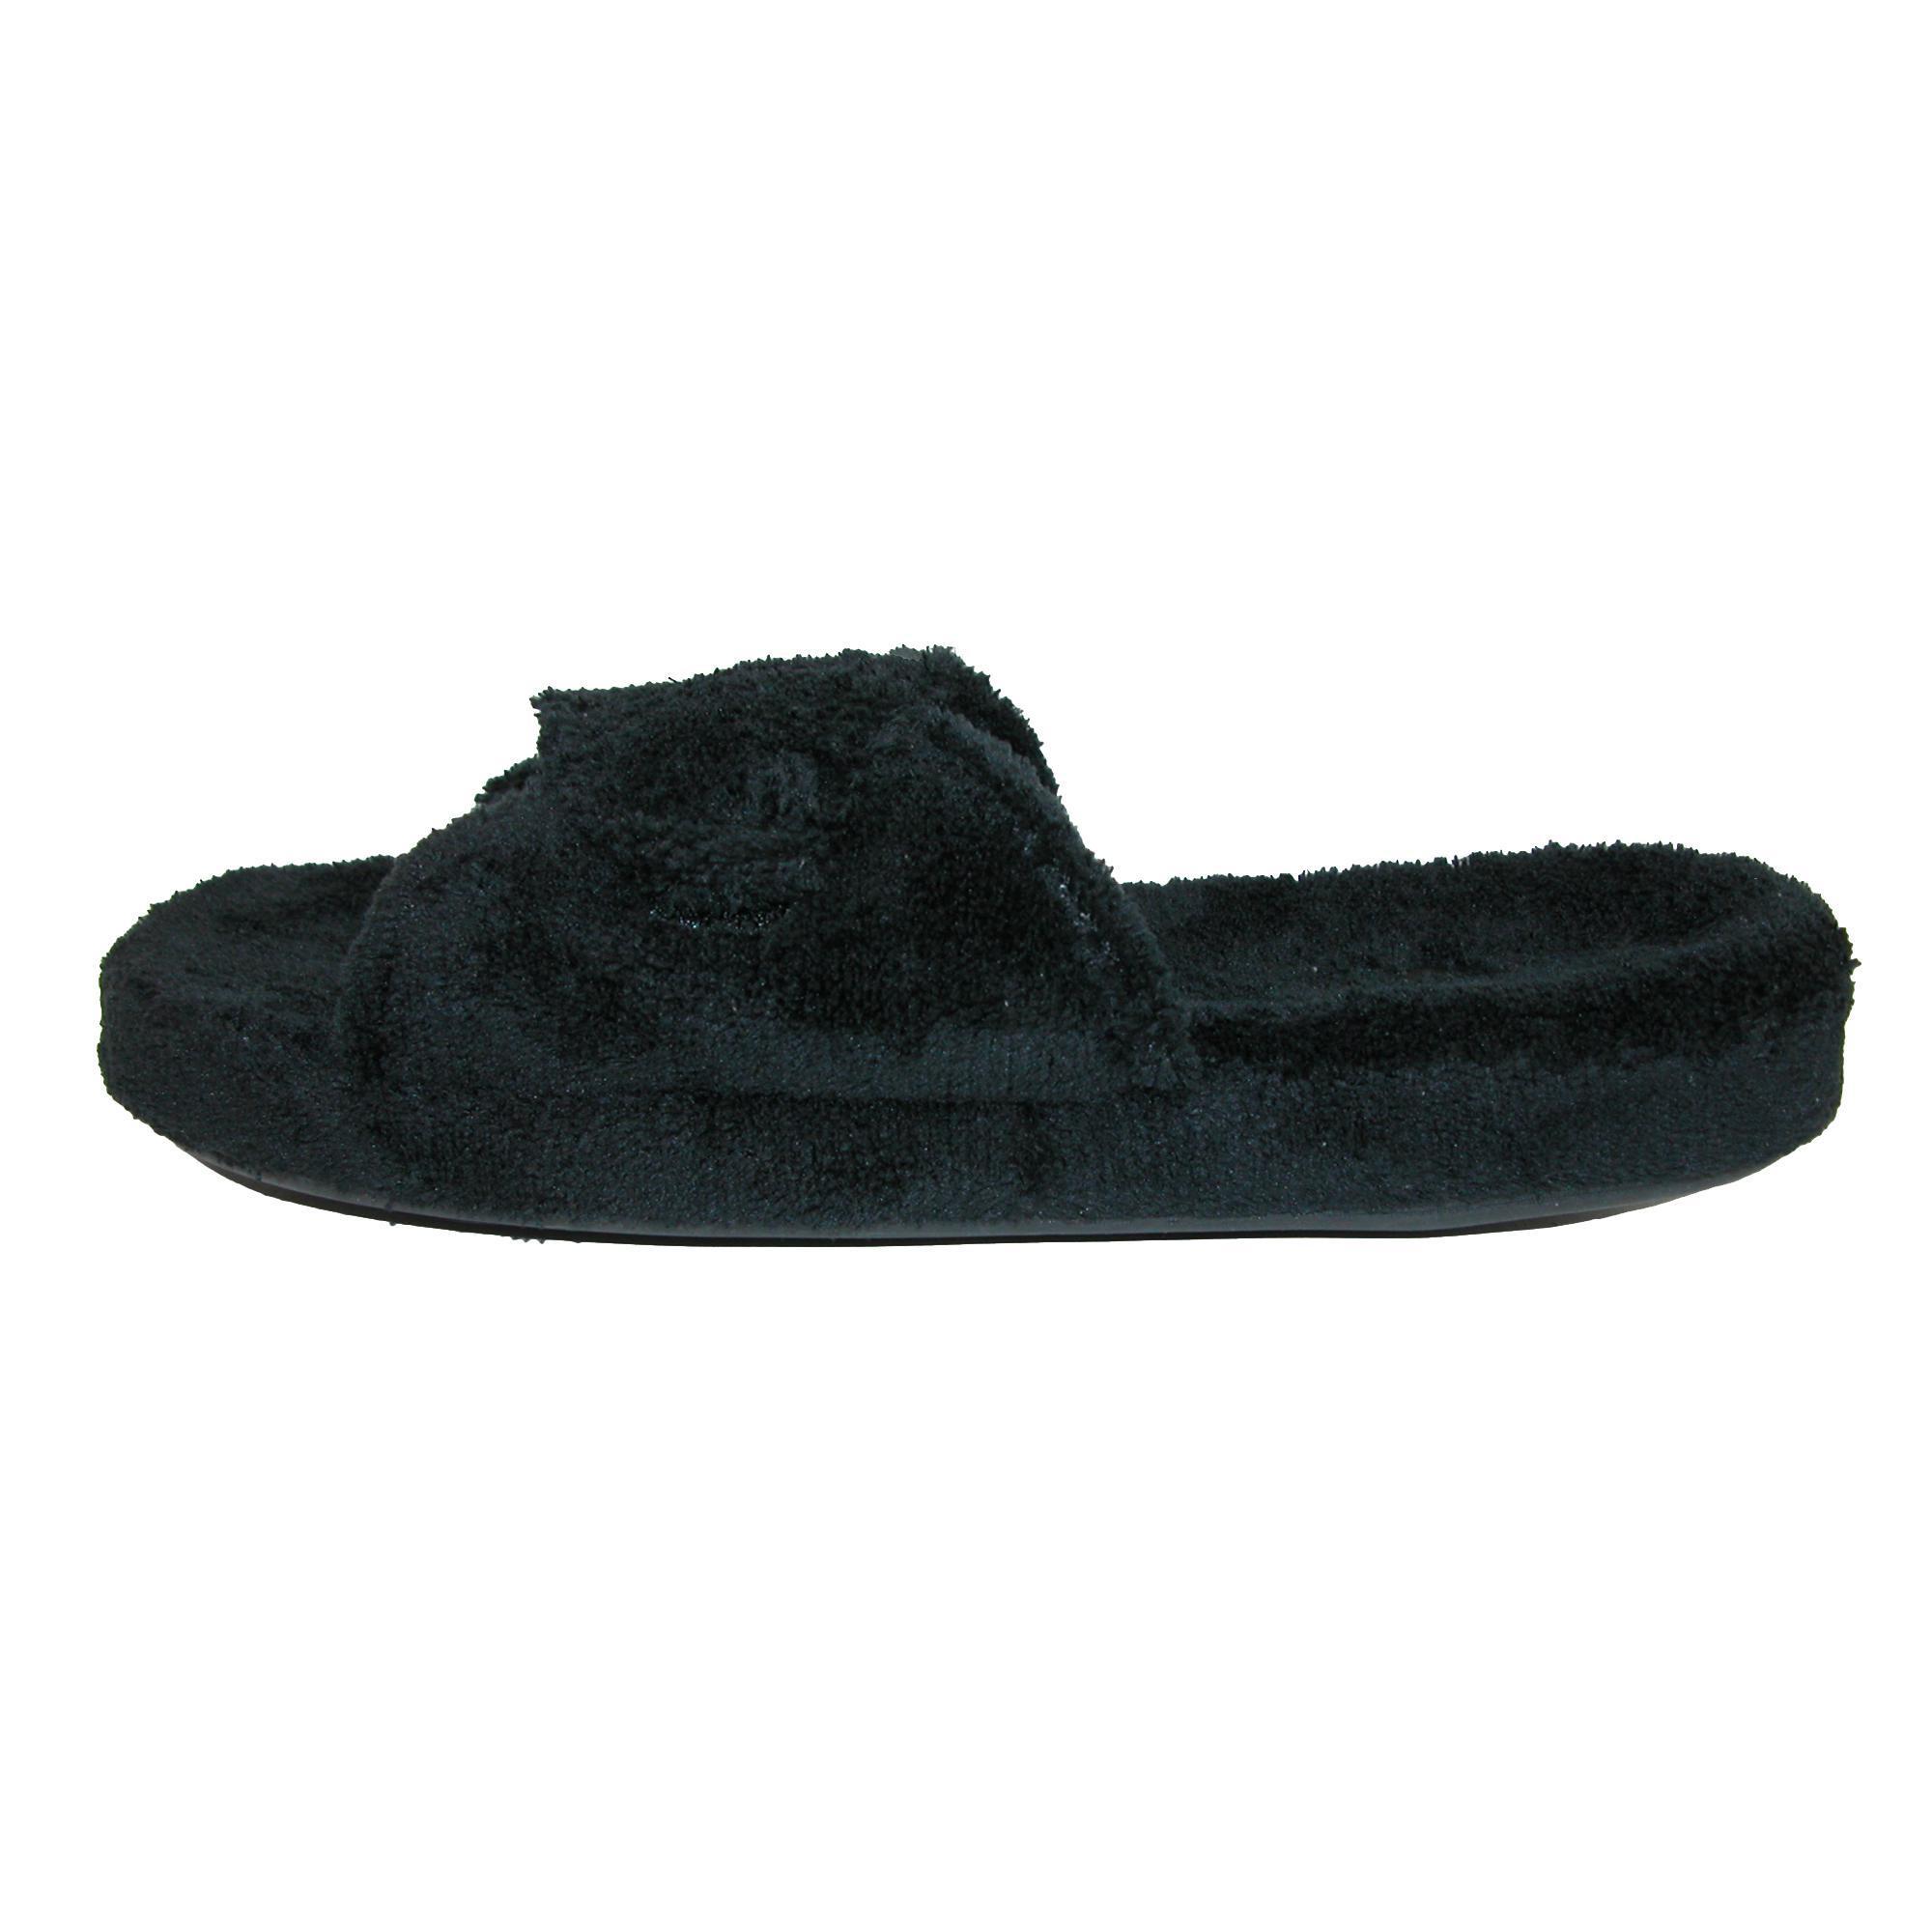 3163d7896380 New Acorn Women s Premium Terry Spa Slide II Slipper